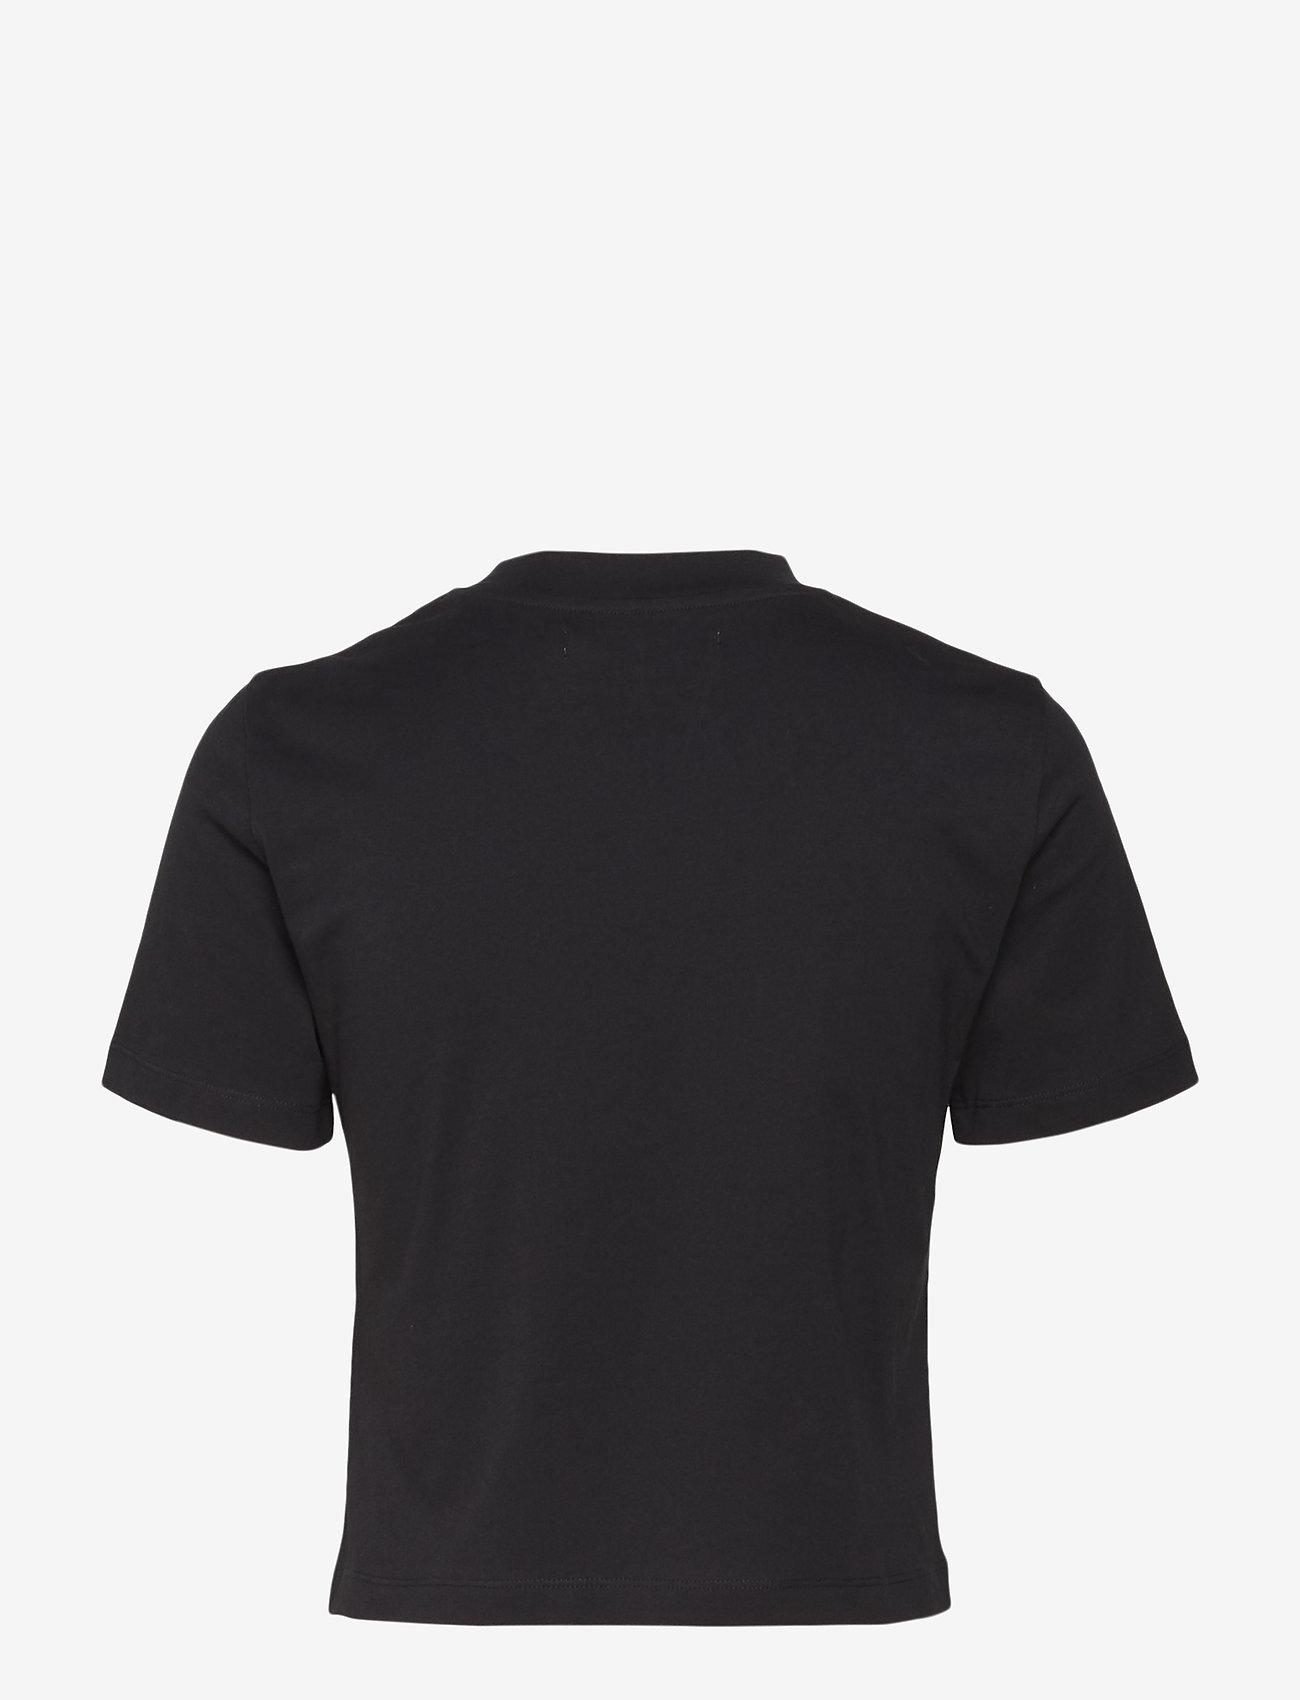 Calvin Klein Jeans - CALVIN LOGO CROPPED TEE - crop tops - ck black